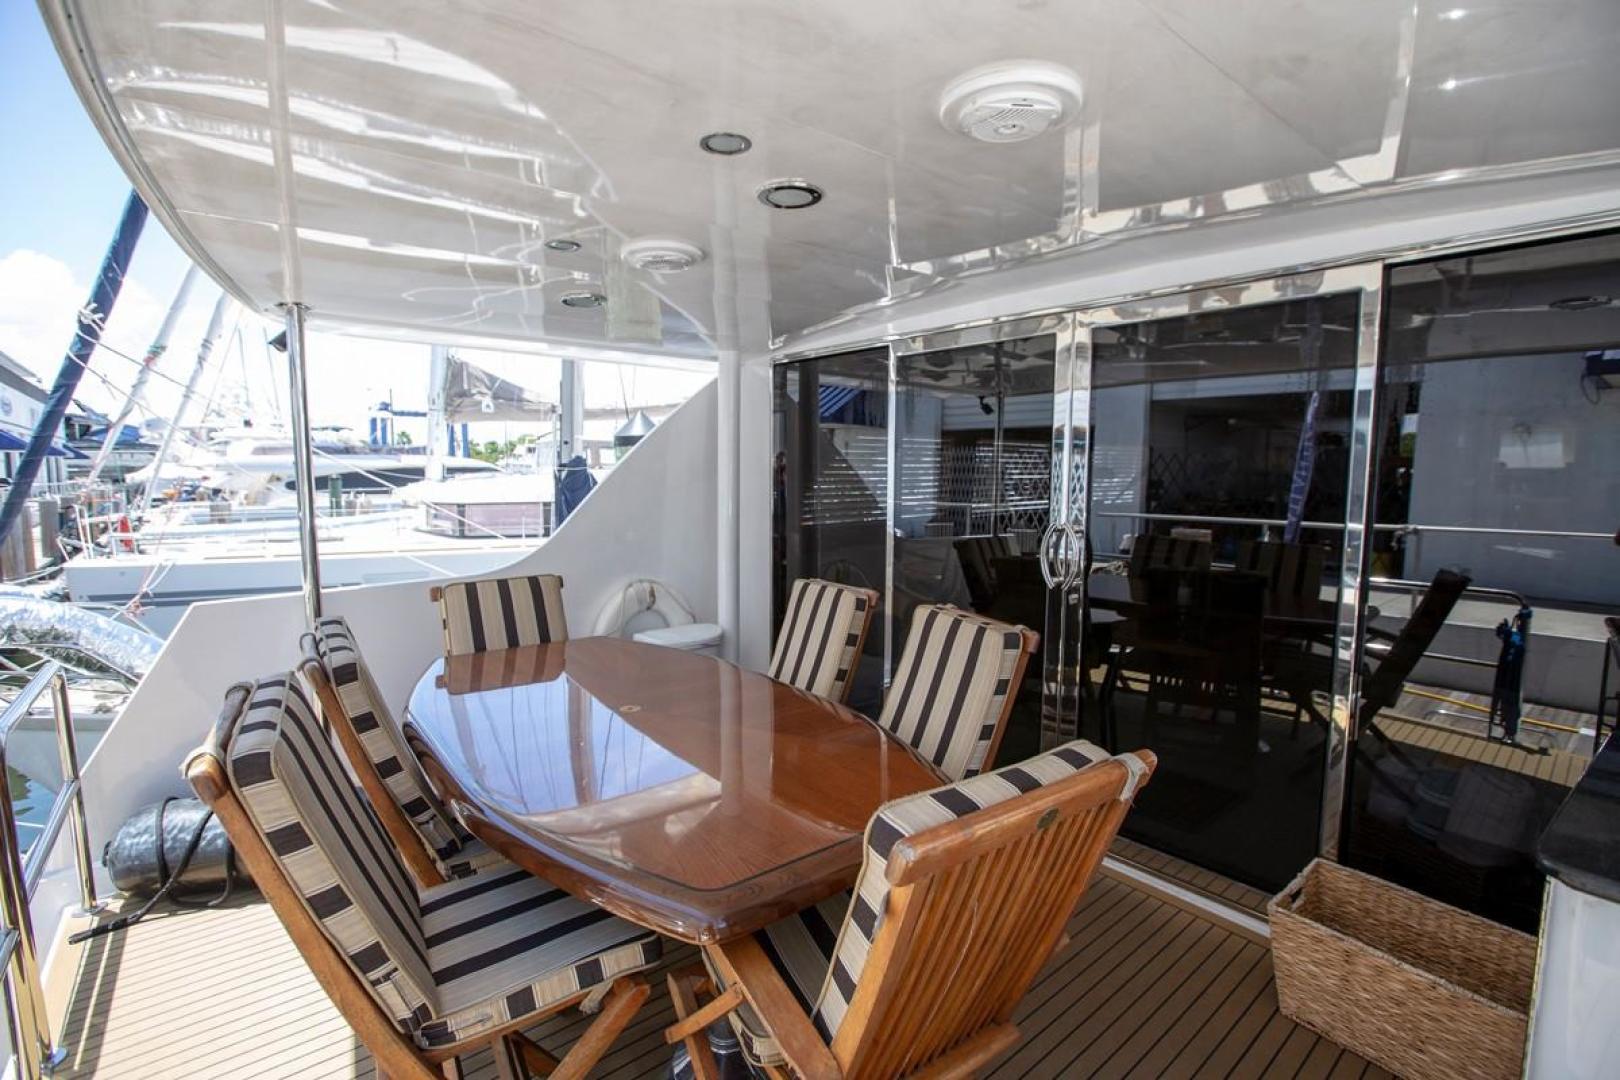 Hatteras-Cockpit Motor Yacht 2000-Getaway Ft. Lauderdale-Florida-United States-977406 | Thumbnail